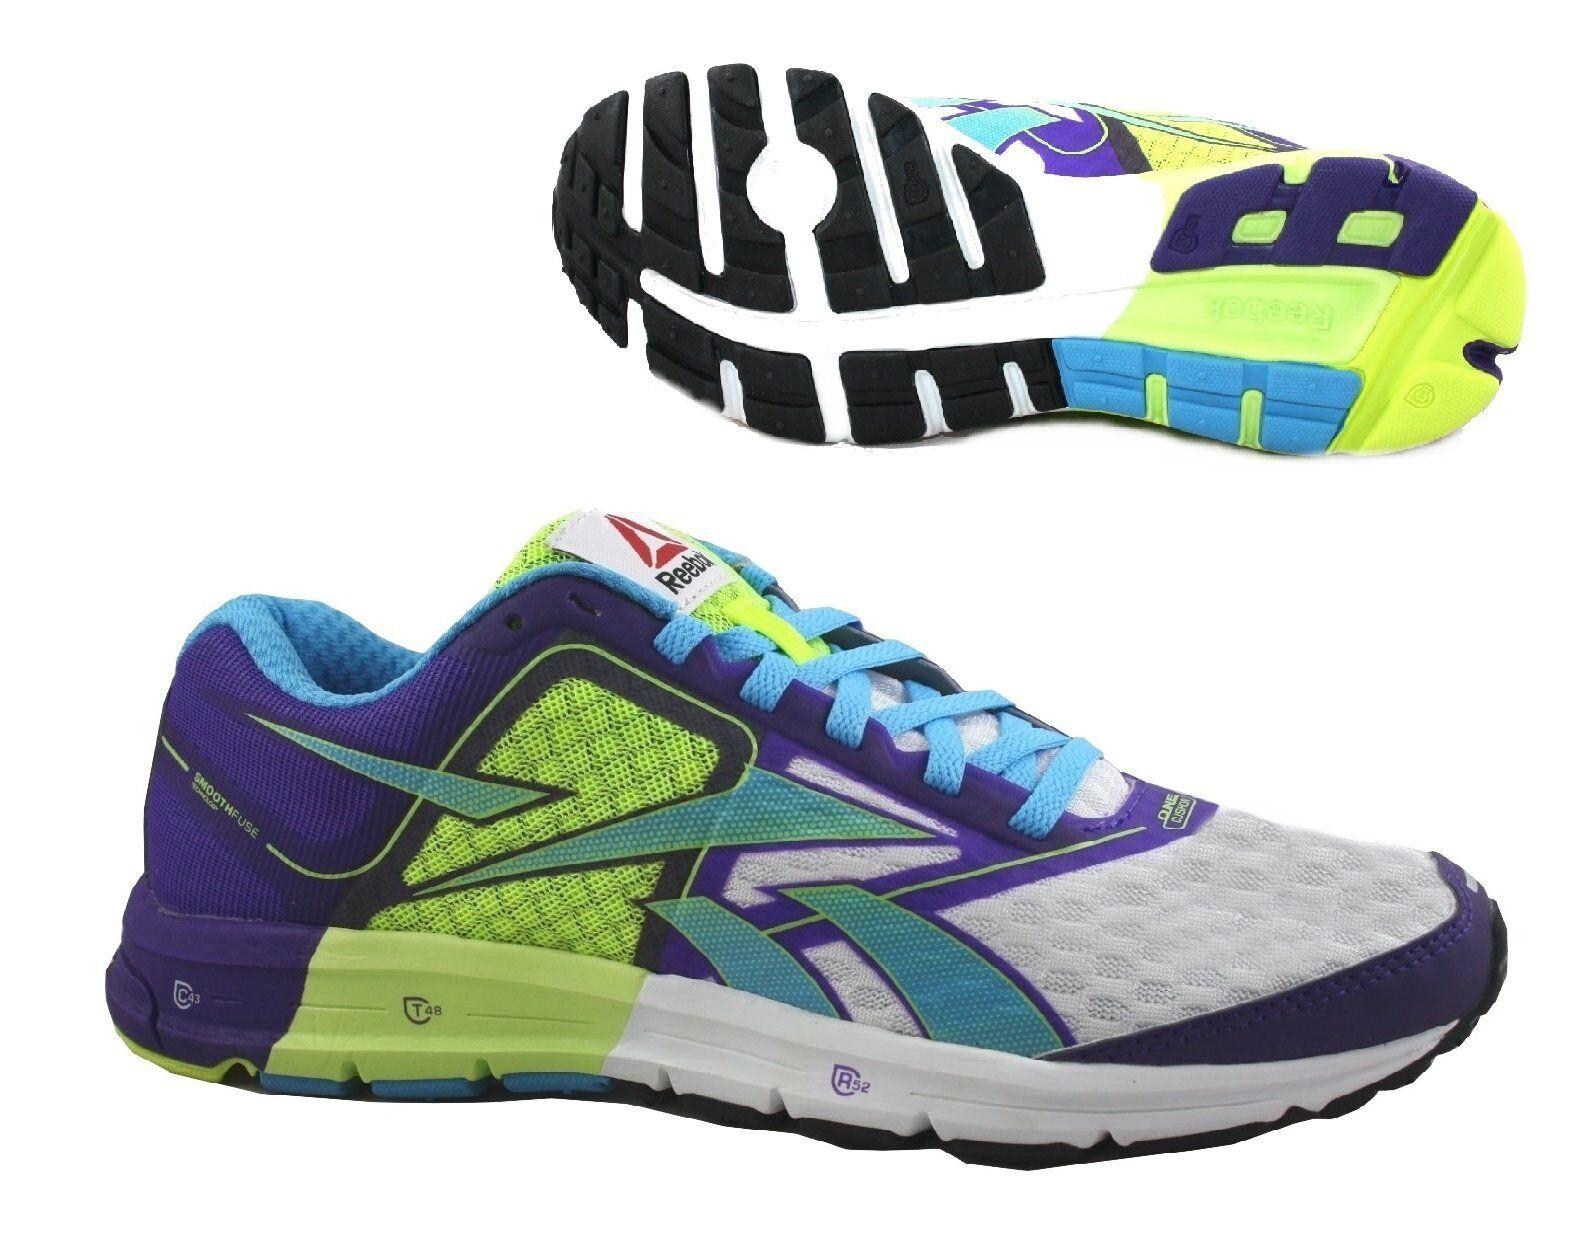 Descuento por tiempo limitado REEBOK ONE CUSHION Damen Laufschuhe Sportschuhe Sneaker Schuhe